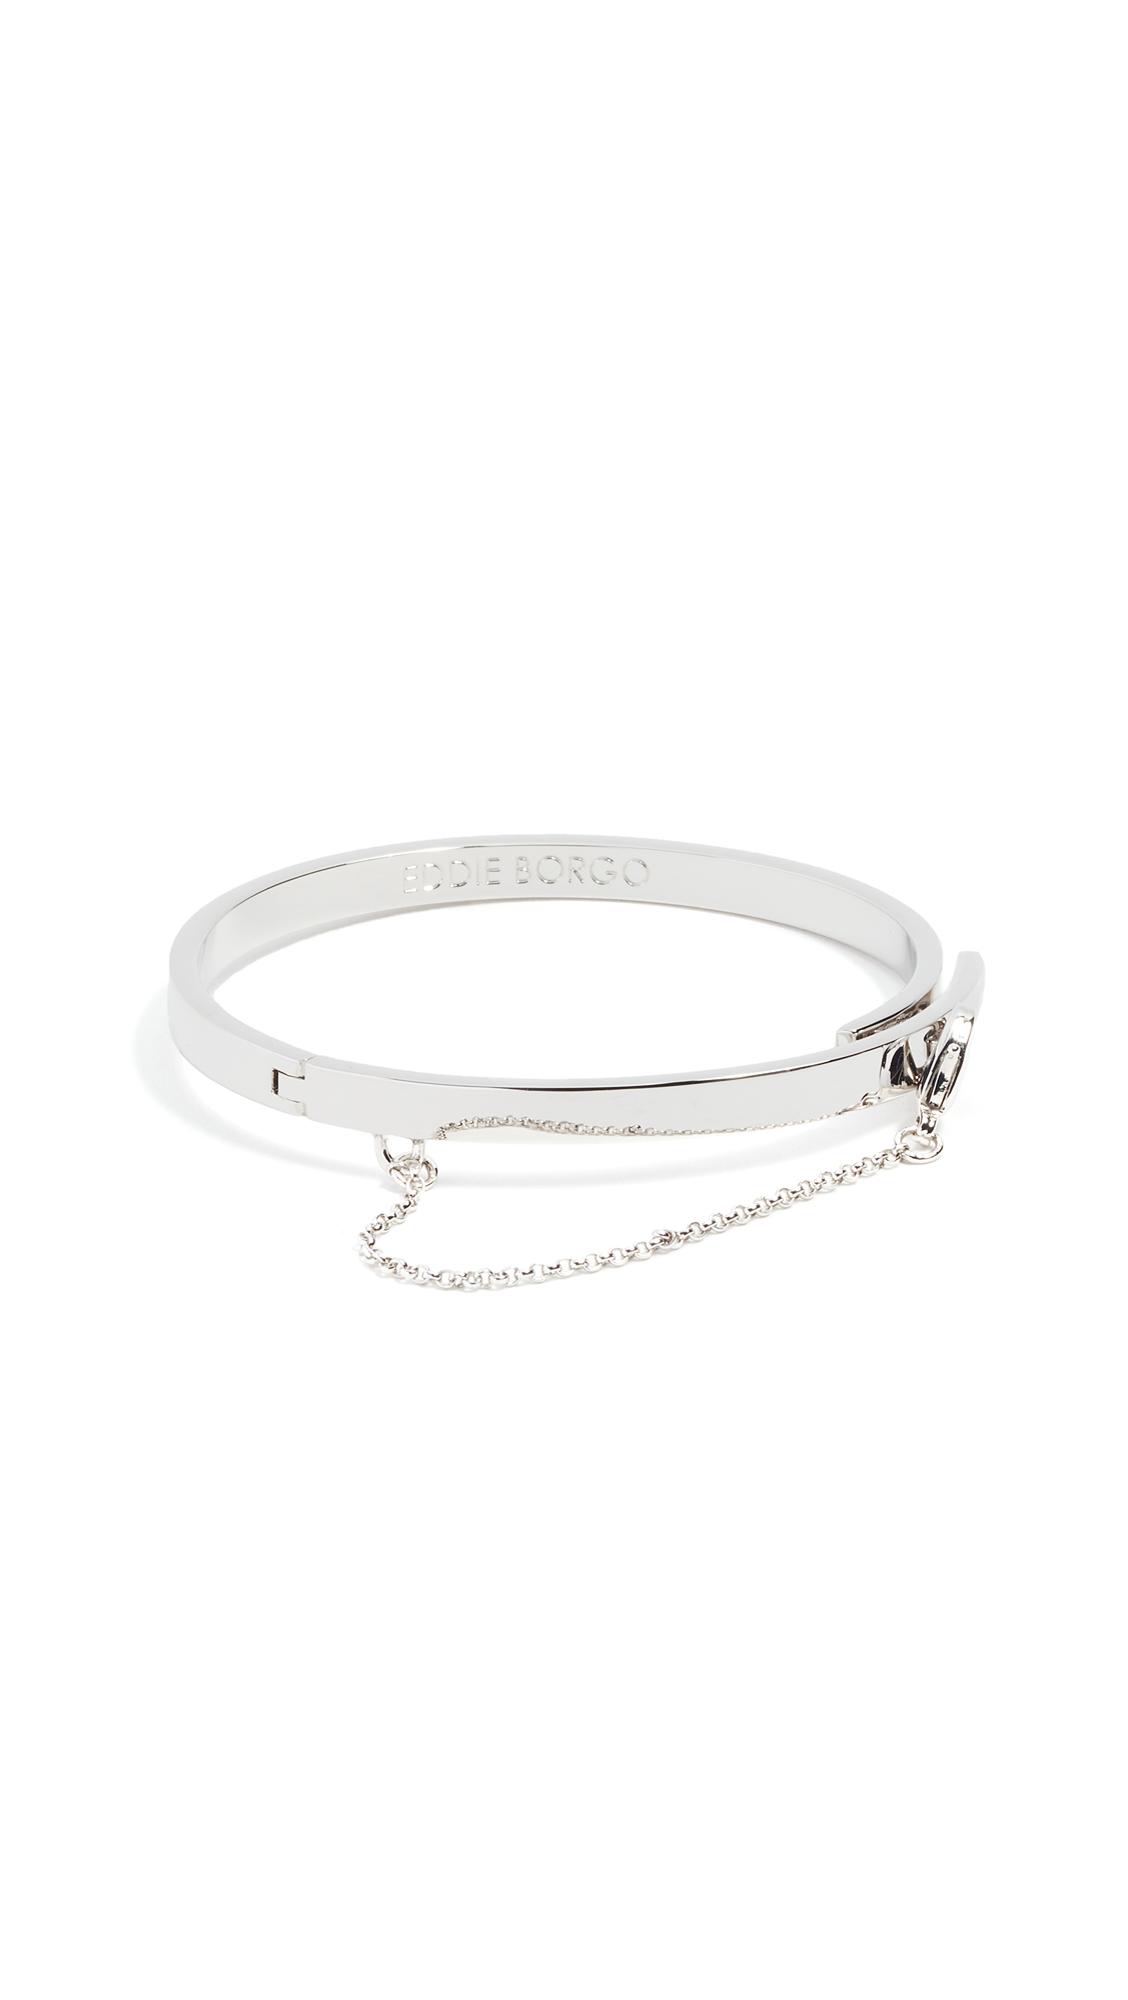 Eddie Borgo Extra Thin Chain Bracelet - Silver